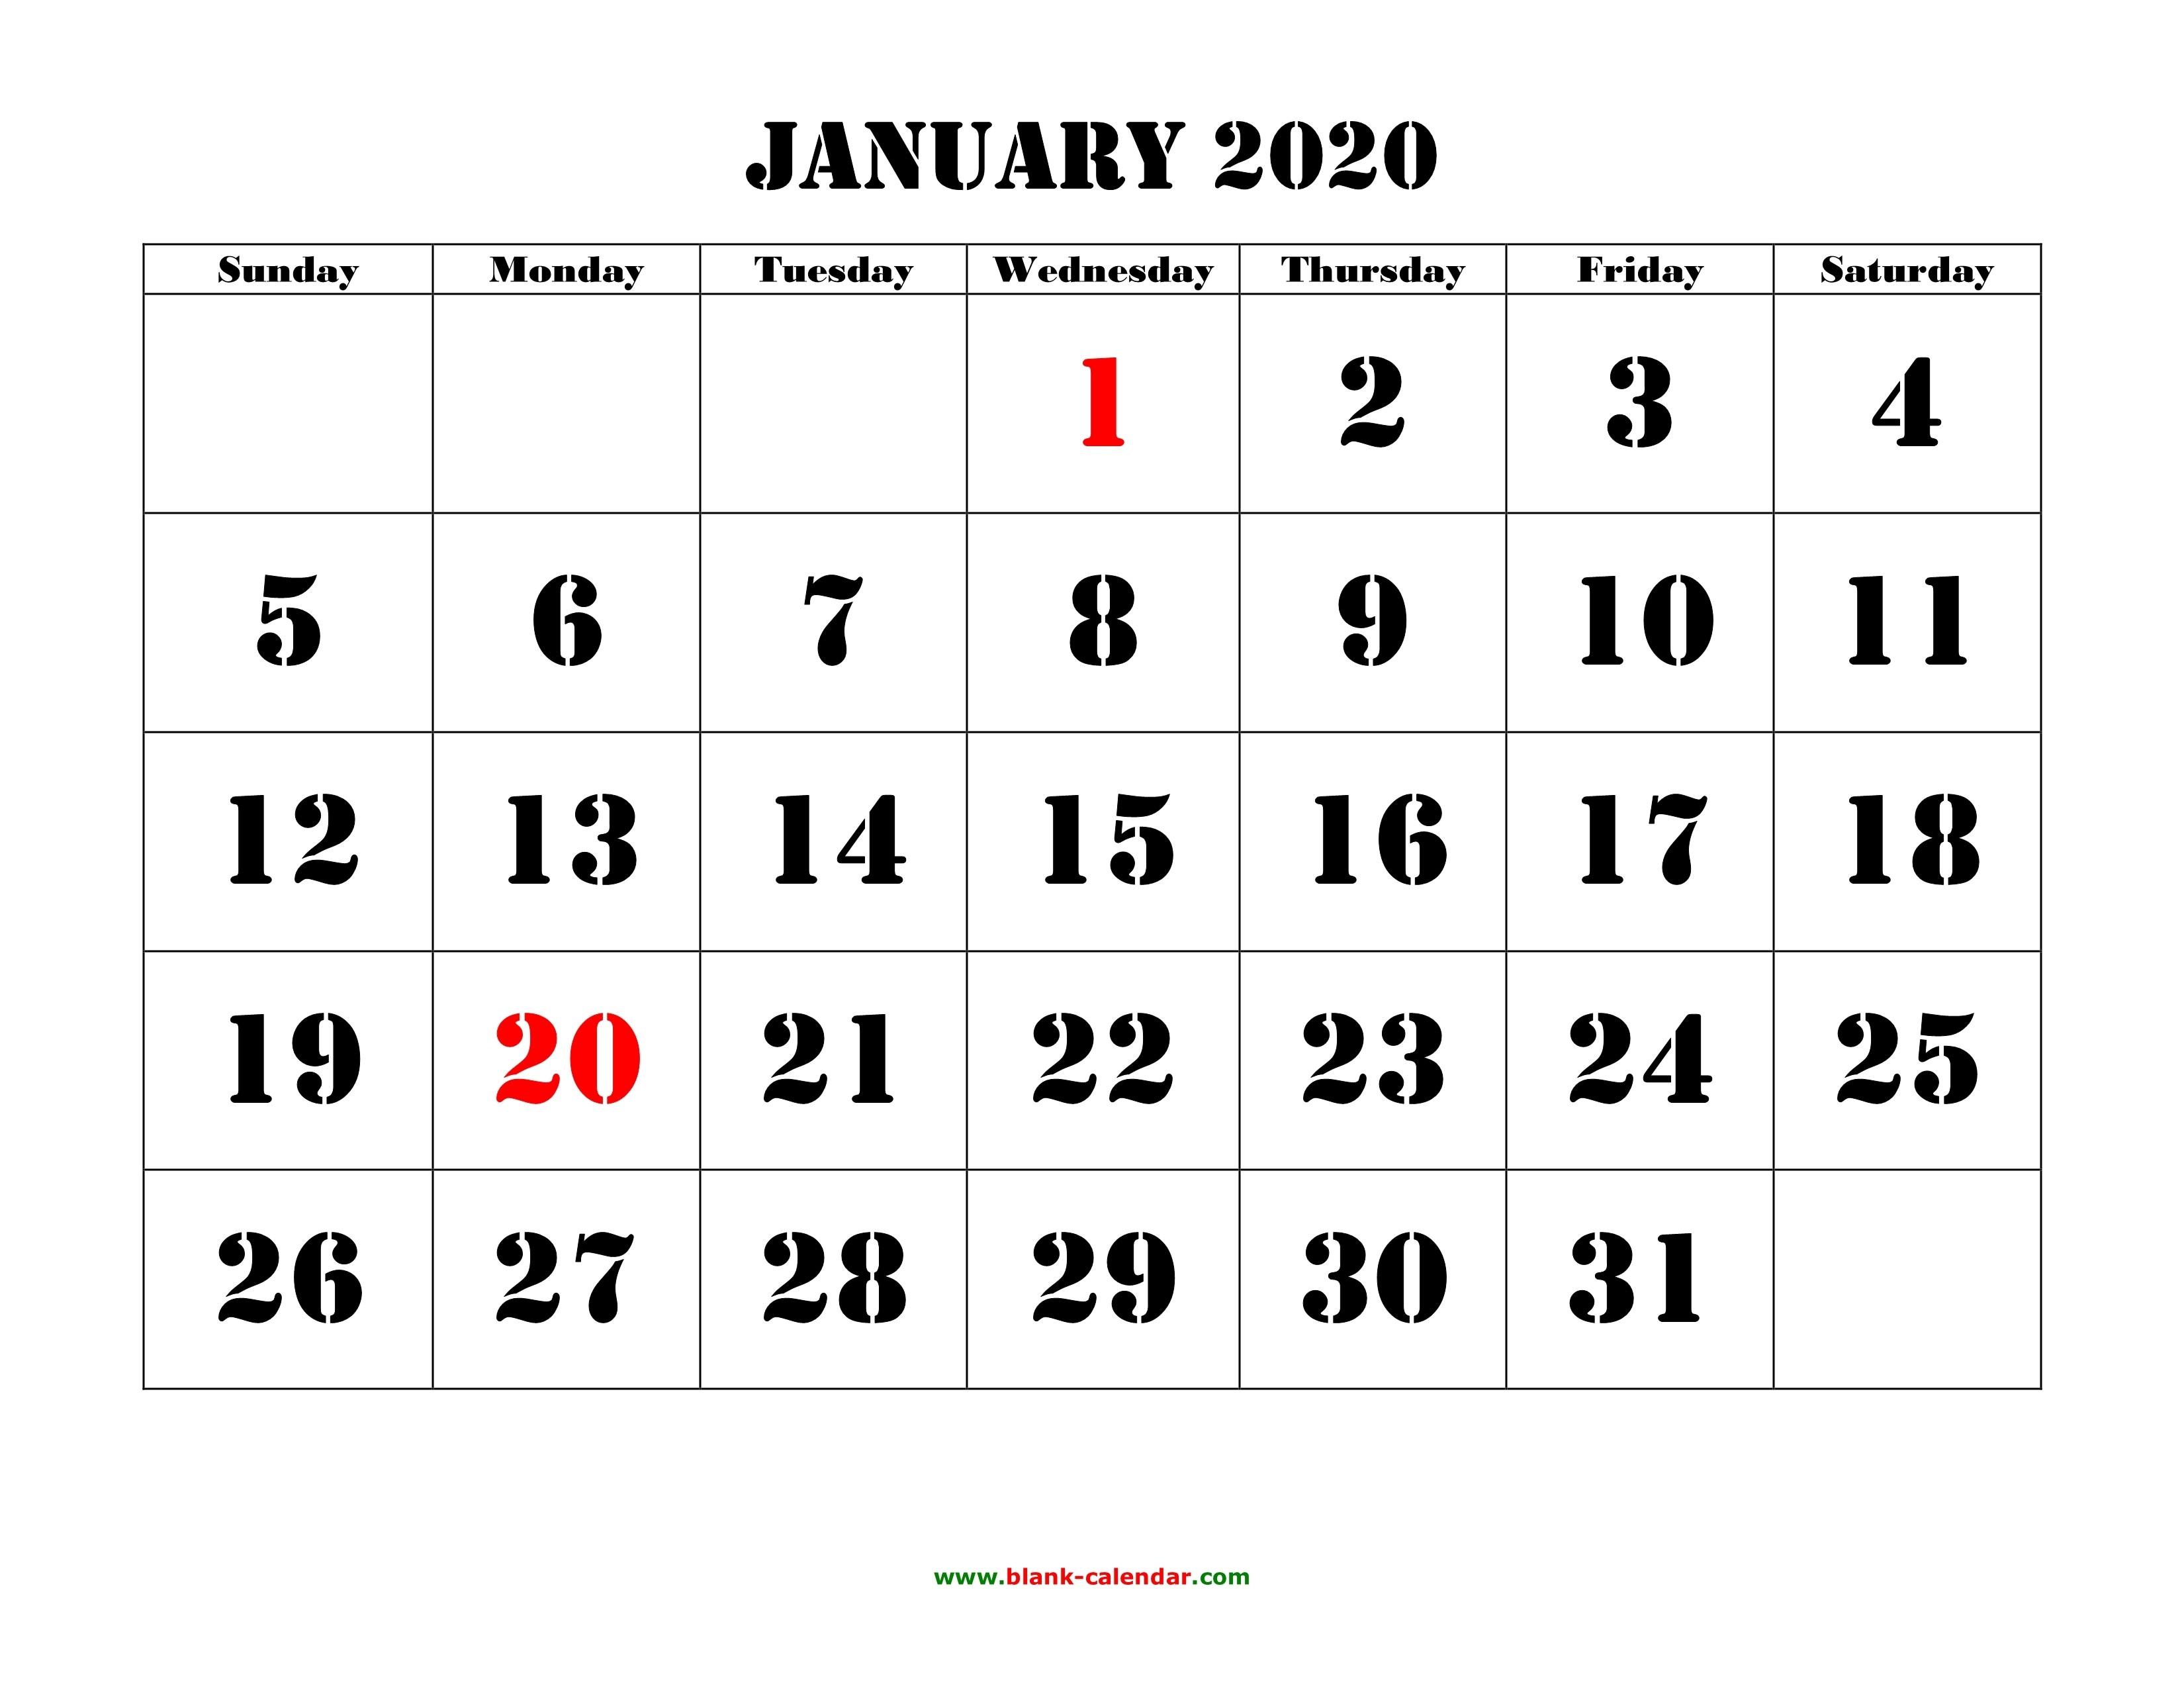 Printable January 2020 Calendar - Free Blank Templates-January 2020 Calendar Page